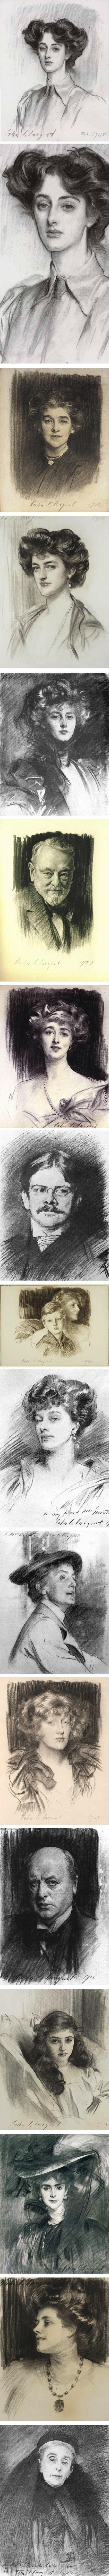 John Singer Sargent portrait drawings ▓█▓▒░▒▓█▓▒░▒▓█▓▒░▒▓█▓ Gᴀʙʏ﹣Fᴇ́ᴇʀɪᴇ ﹕ Bɪᴊᴏᴜx ᴀ̀ ᴛʜᴇ̀ᴍᴇs ☞  http://www.alittlemarket.com/boutique/gaby_feerie-132444.html ▓█▓▒░▒▓█▓▒░▒▓█▓▒░▒▓█▓